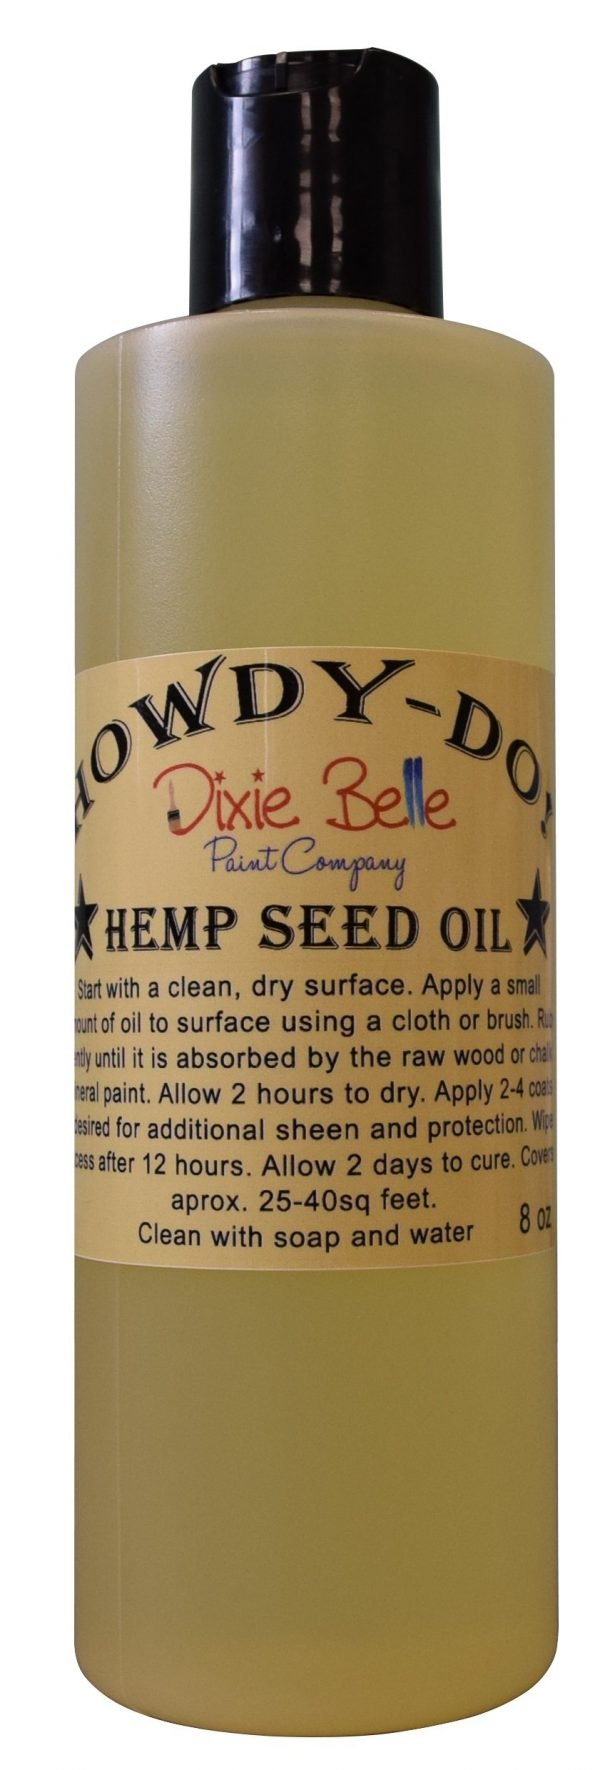 Dixie Belle Hemp Seed Oil